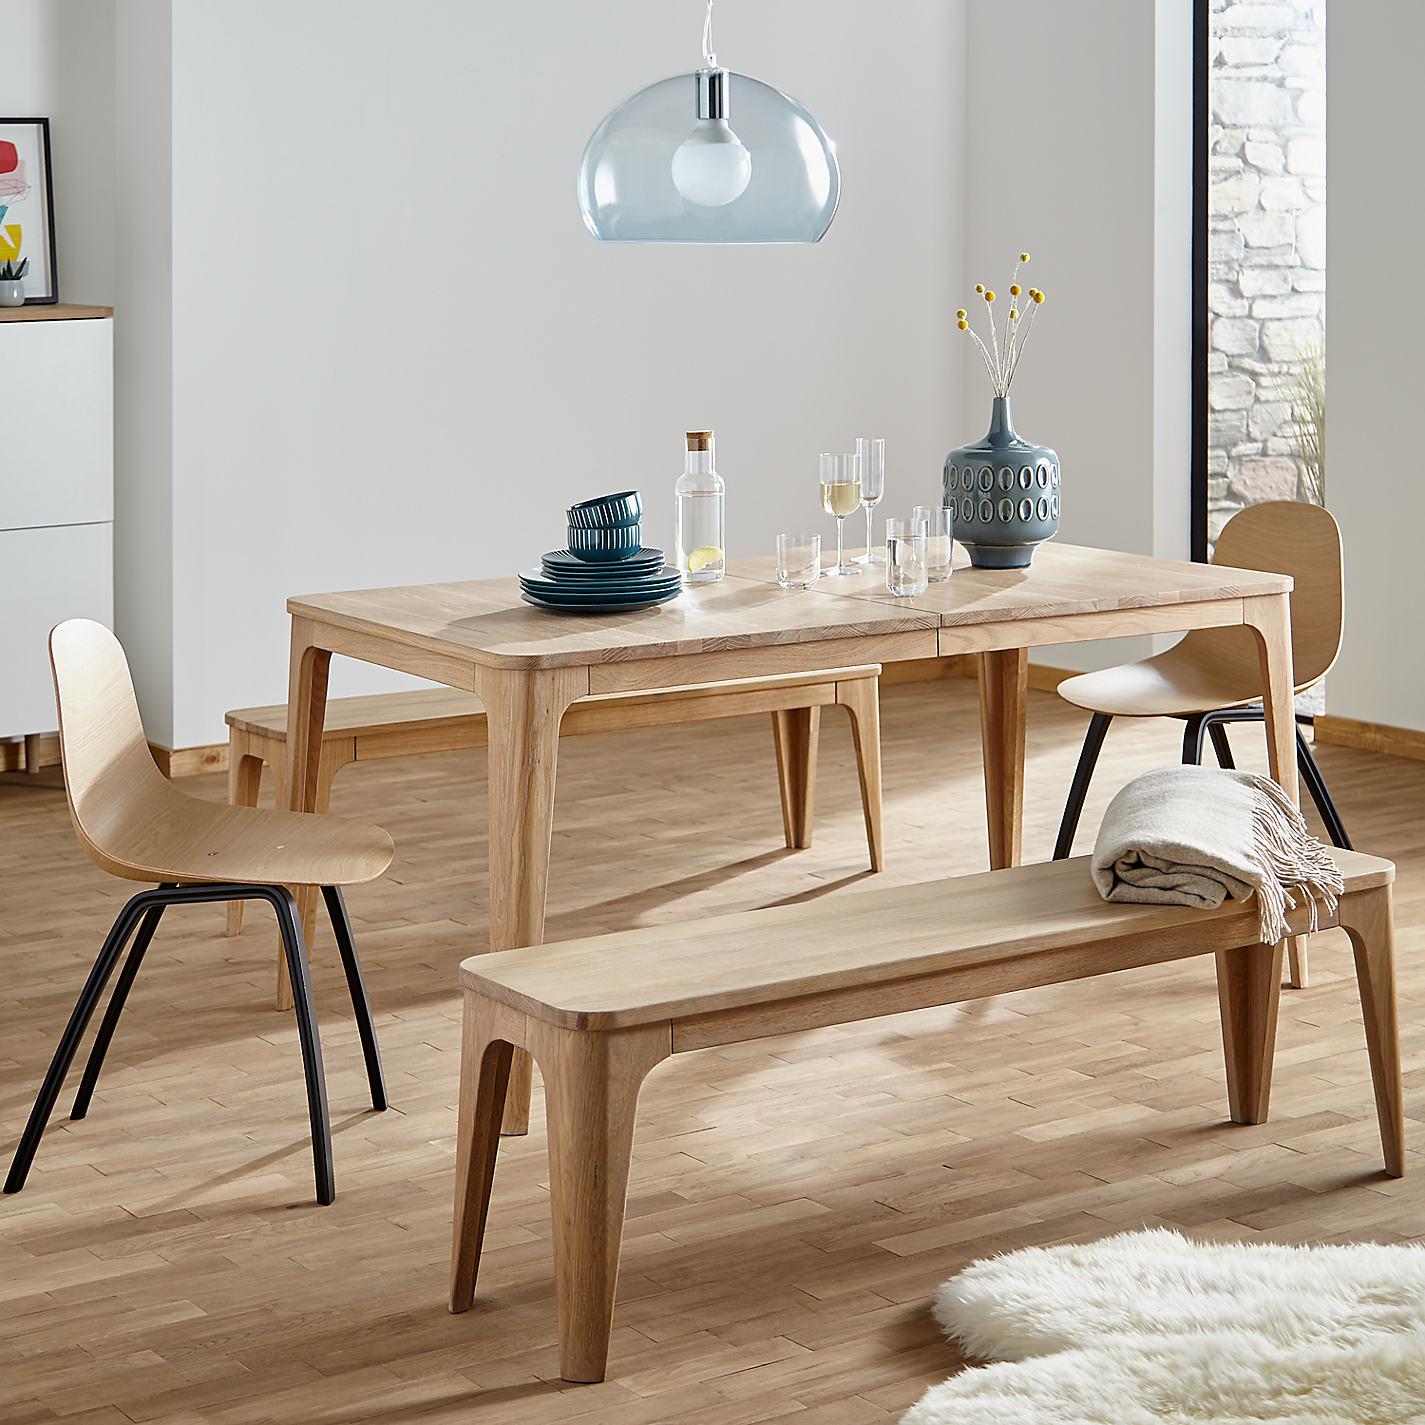 Buy Ebbe Gehl for John Lewis Mira Living & Dining Room Furniture ...